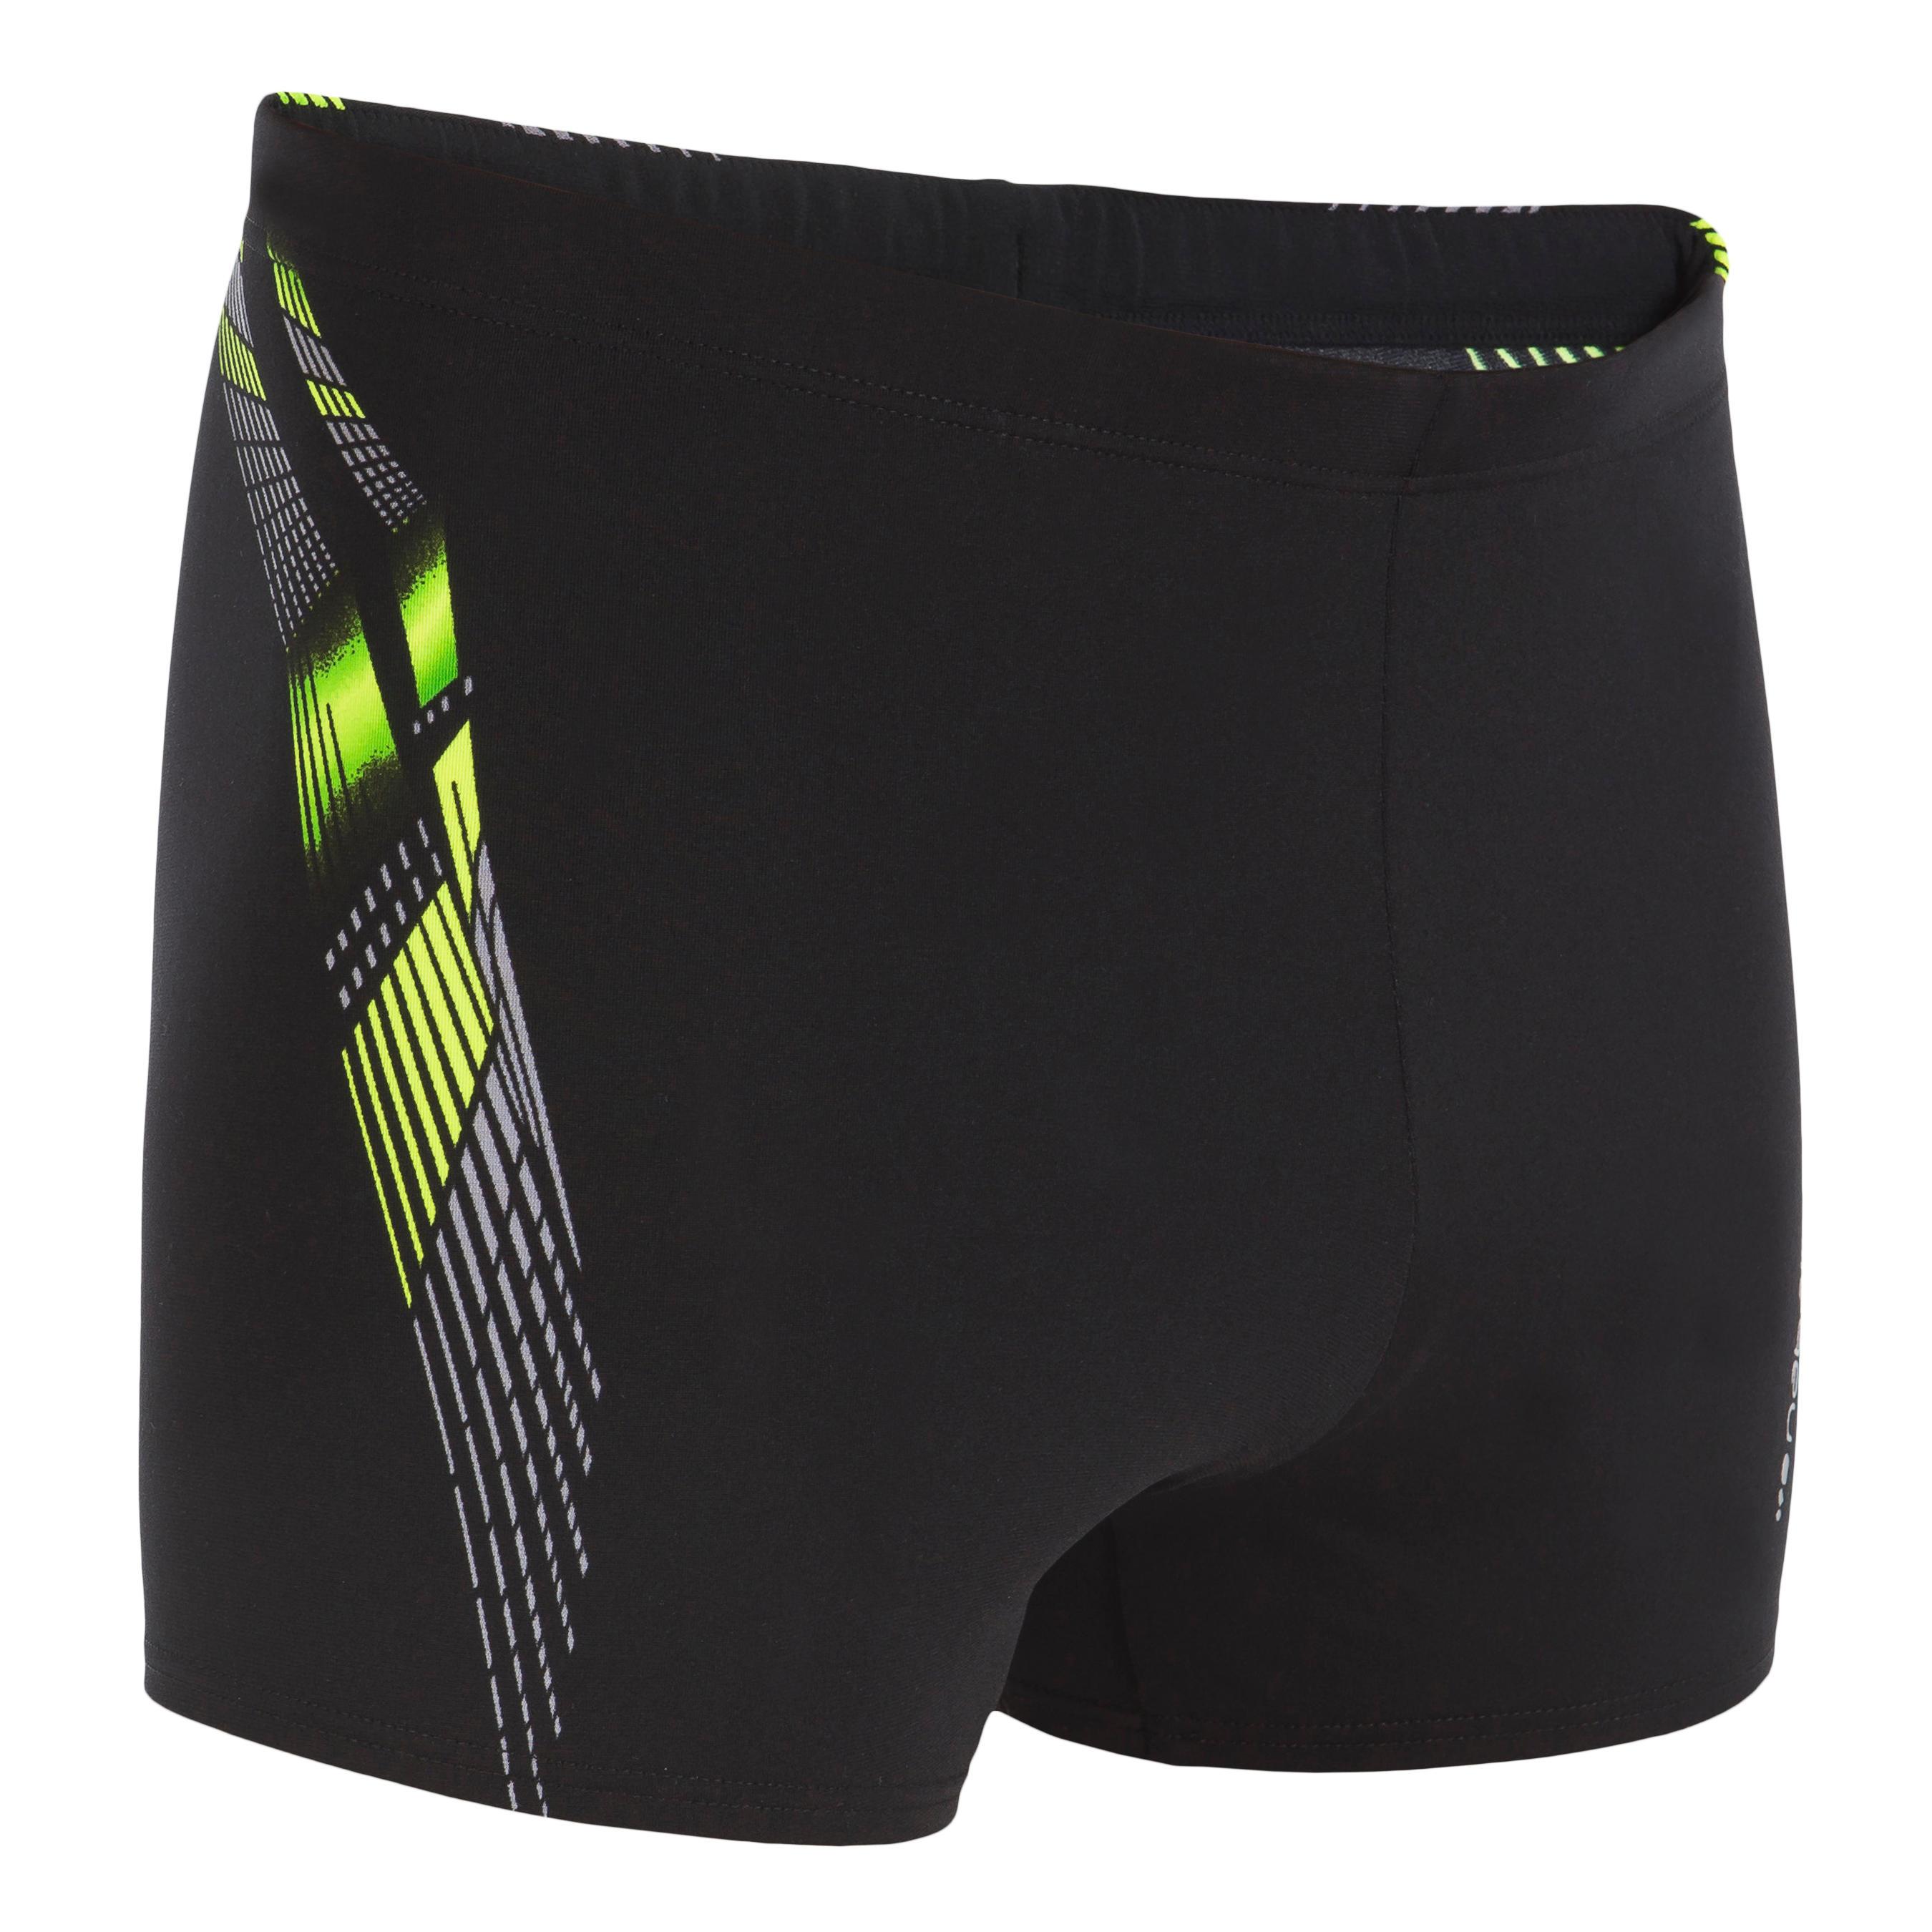 B-Fit Men's Boxer Swim Shorts - Adi Black Yellow